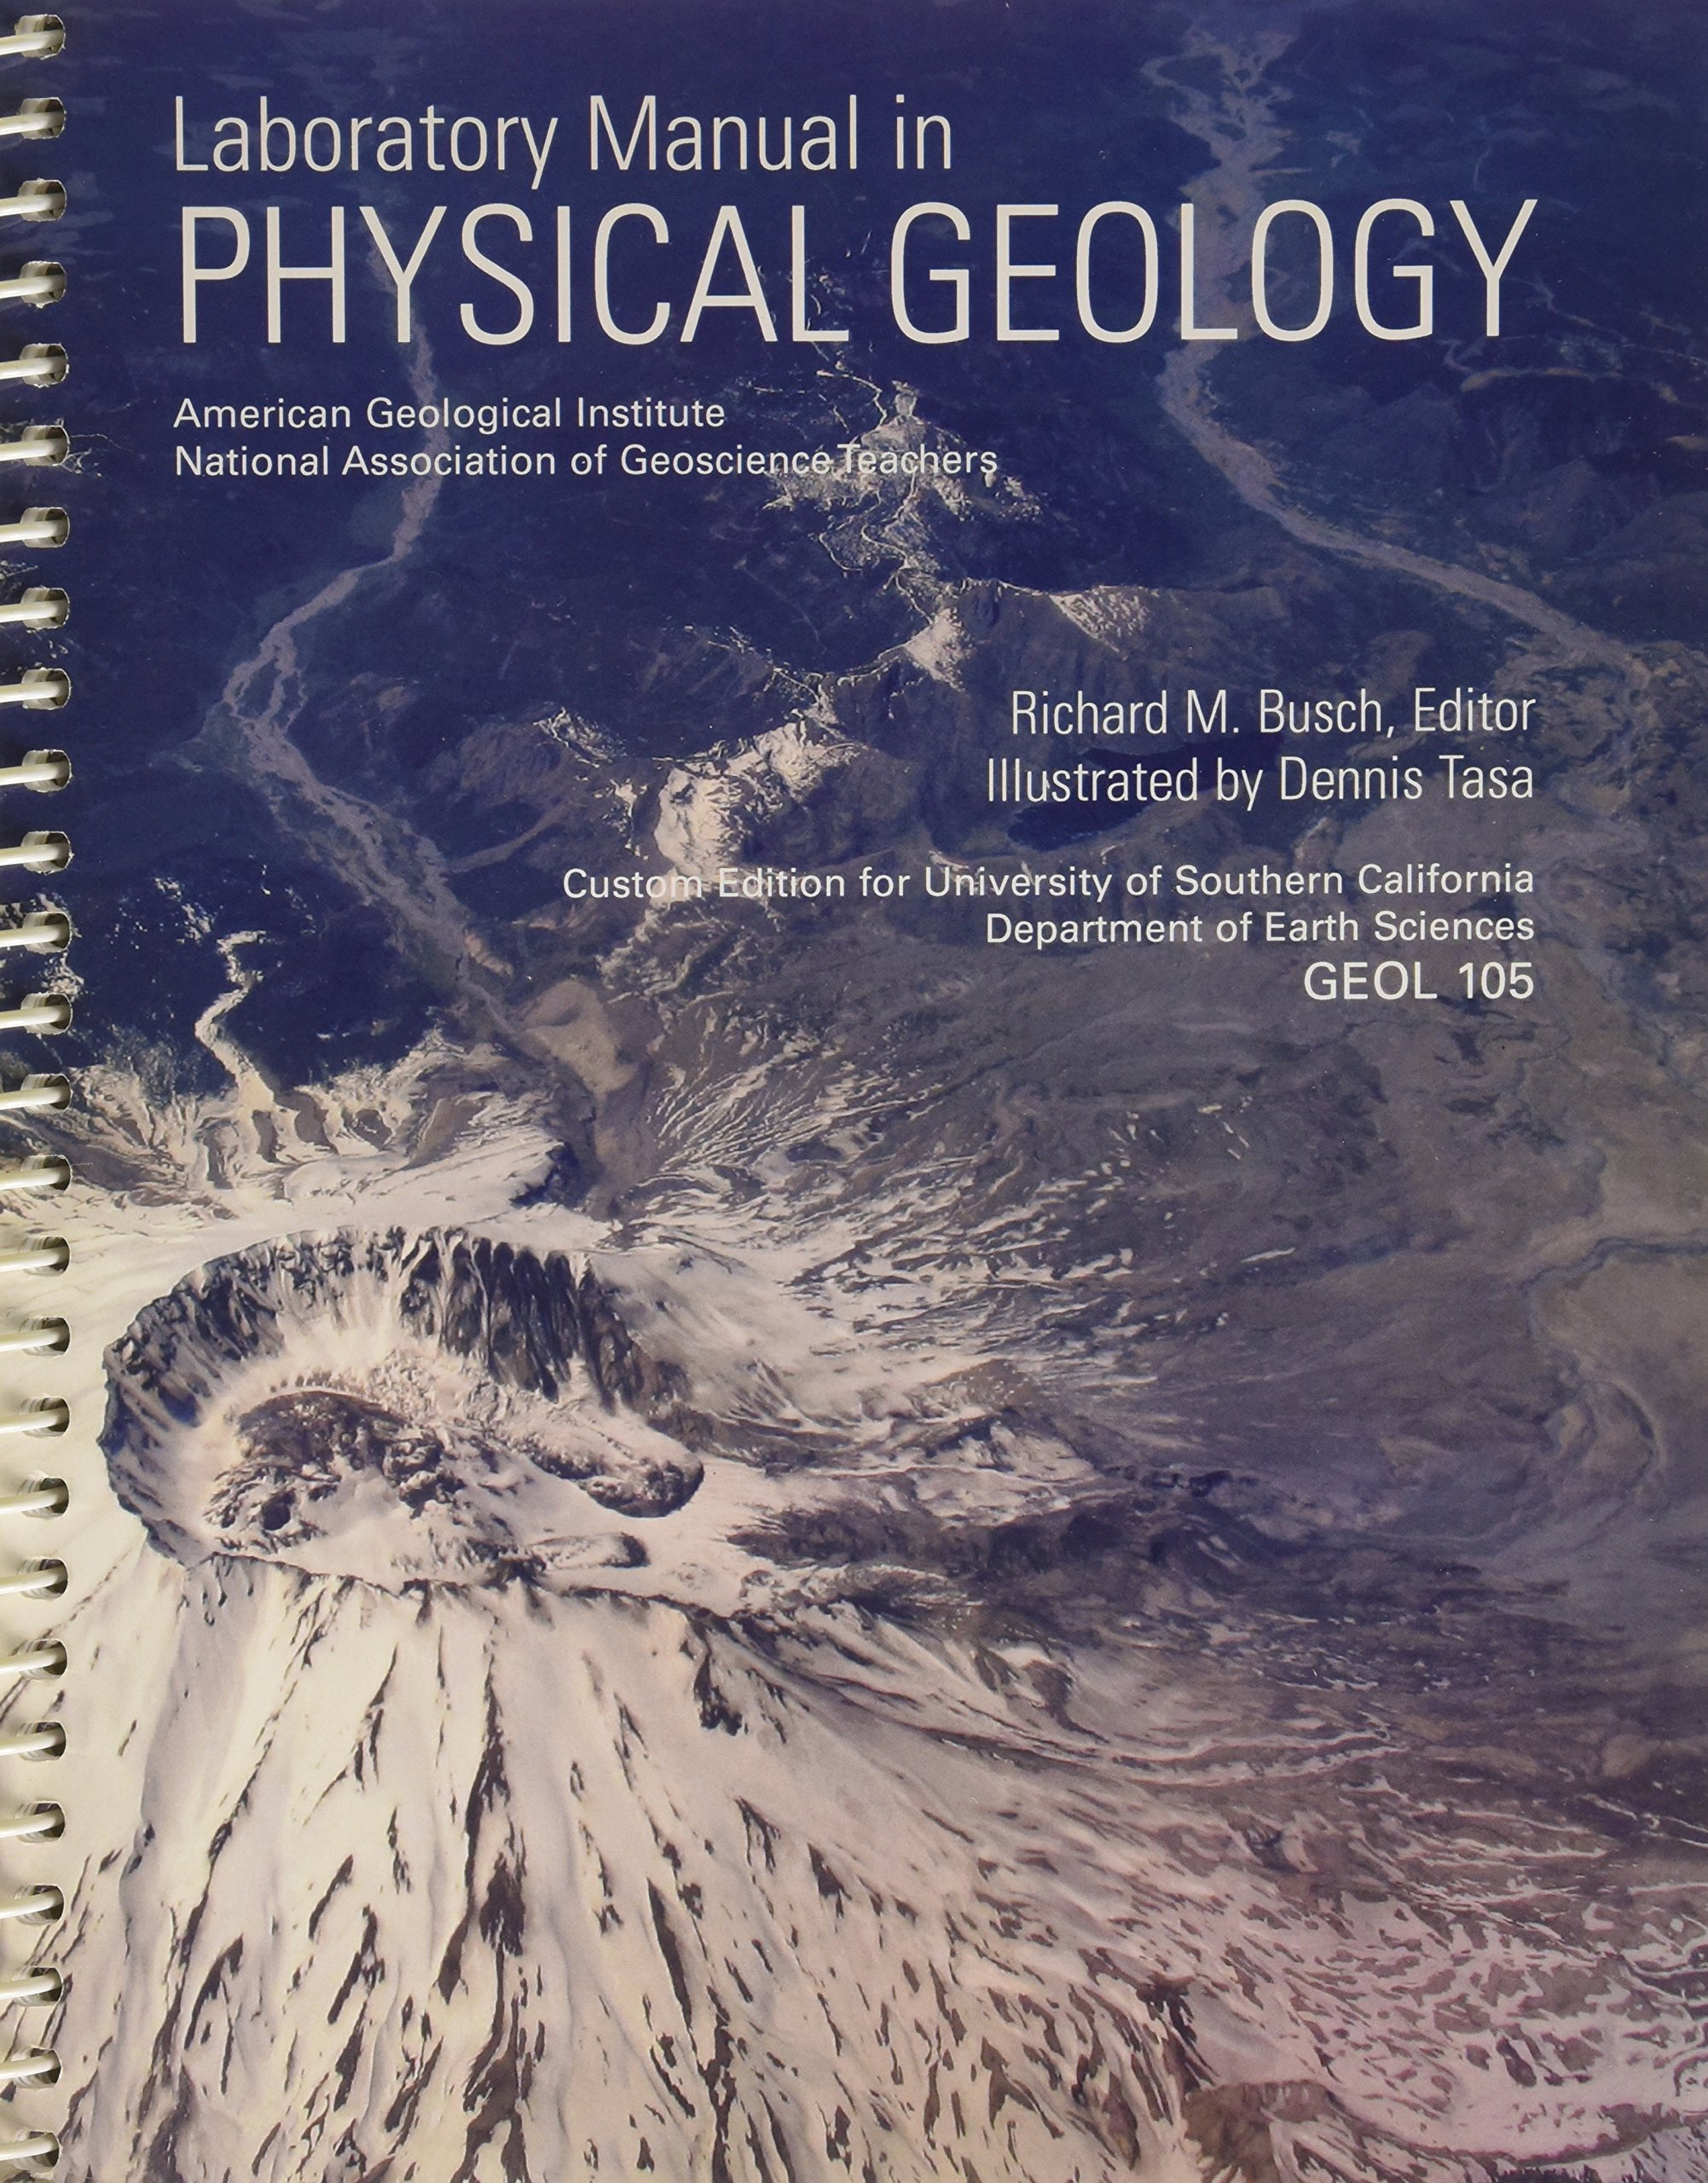 Laboratory Manual in Physical Geology: Editior Richard M. Busch:  9780536051165: Amazon.com: Books